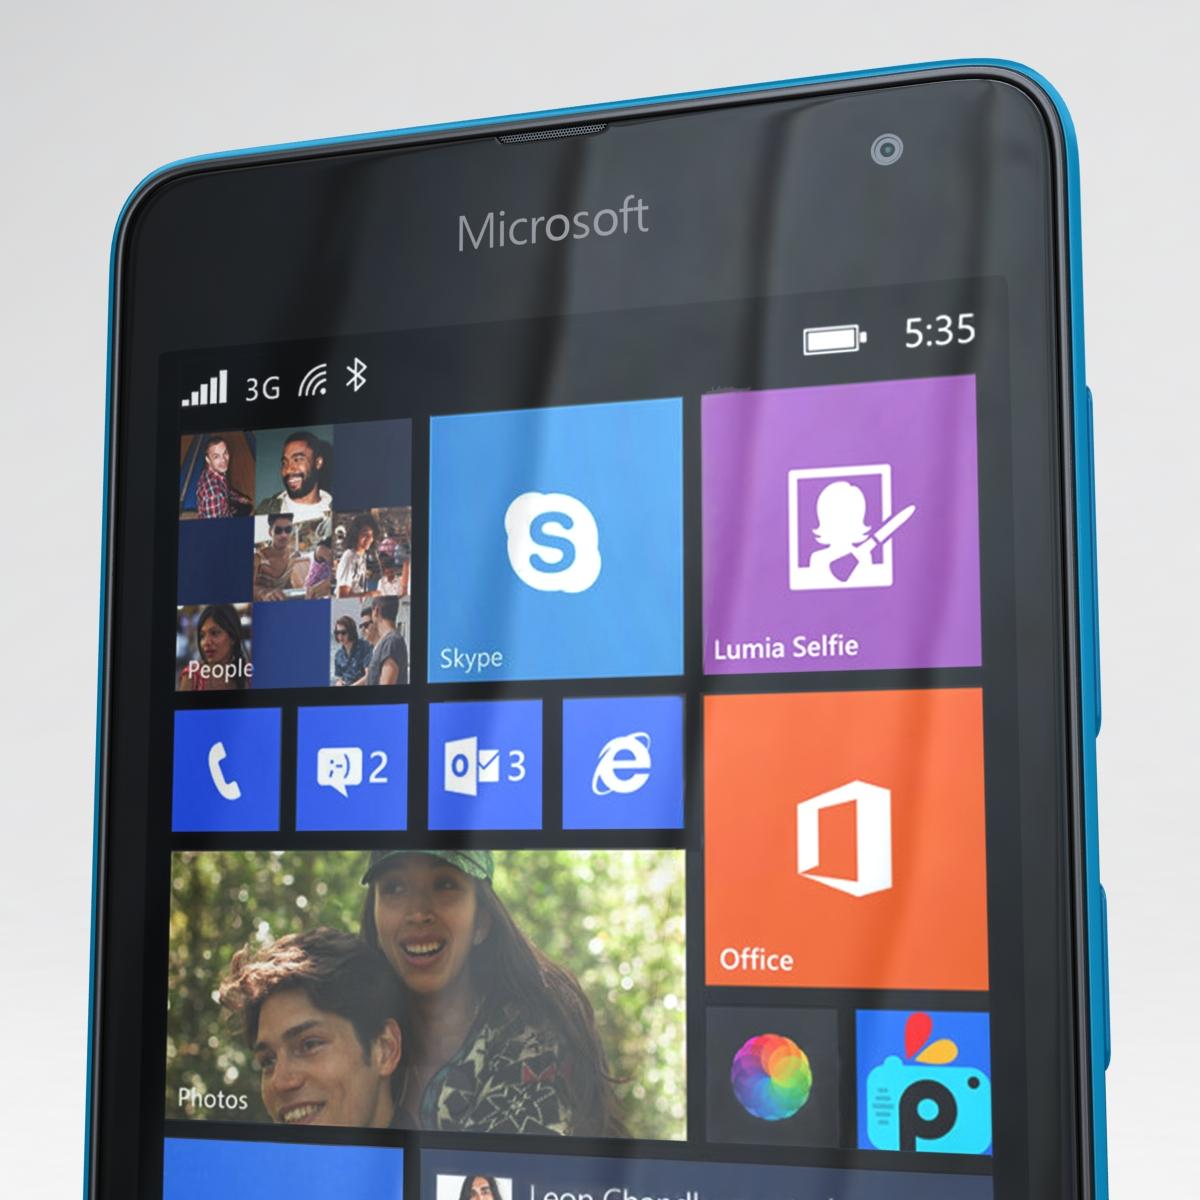 microsoft lumia 535 and dual sim blue 3d model 3ds max fbx c4d obj 204537